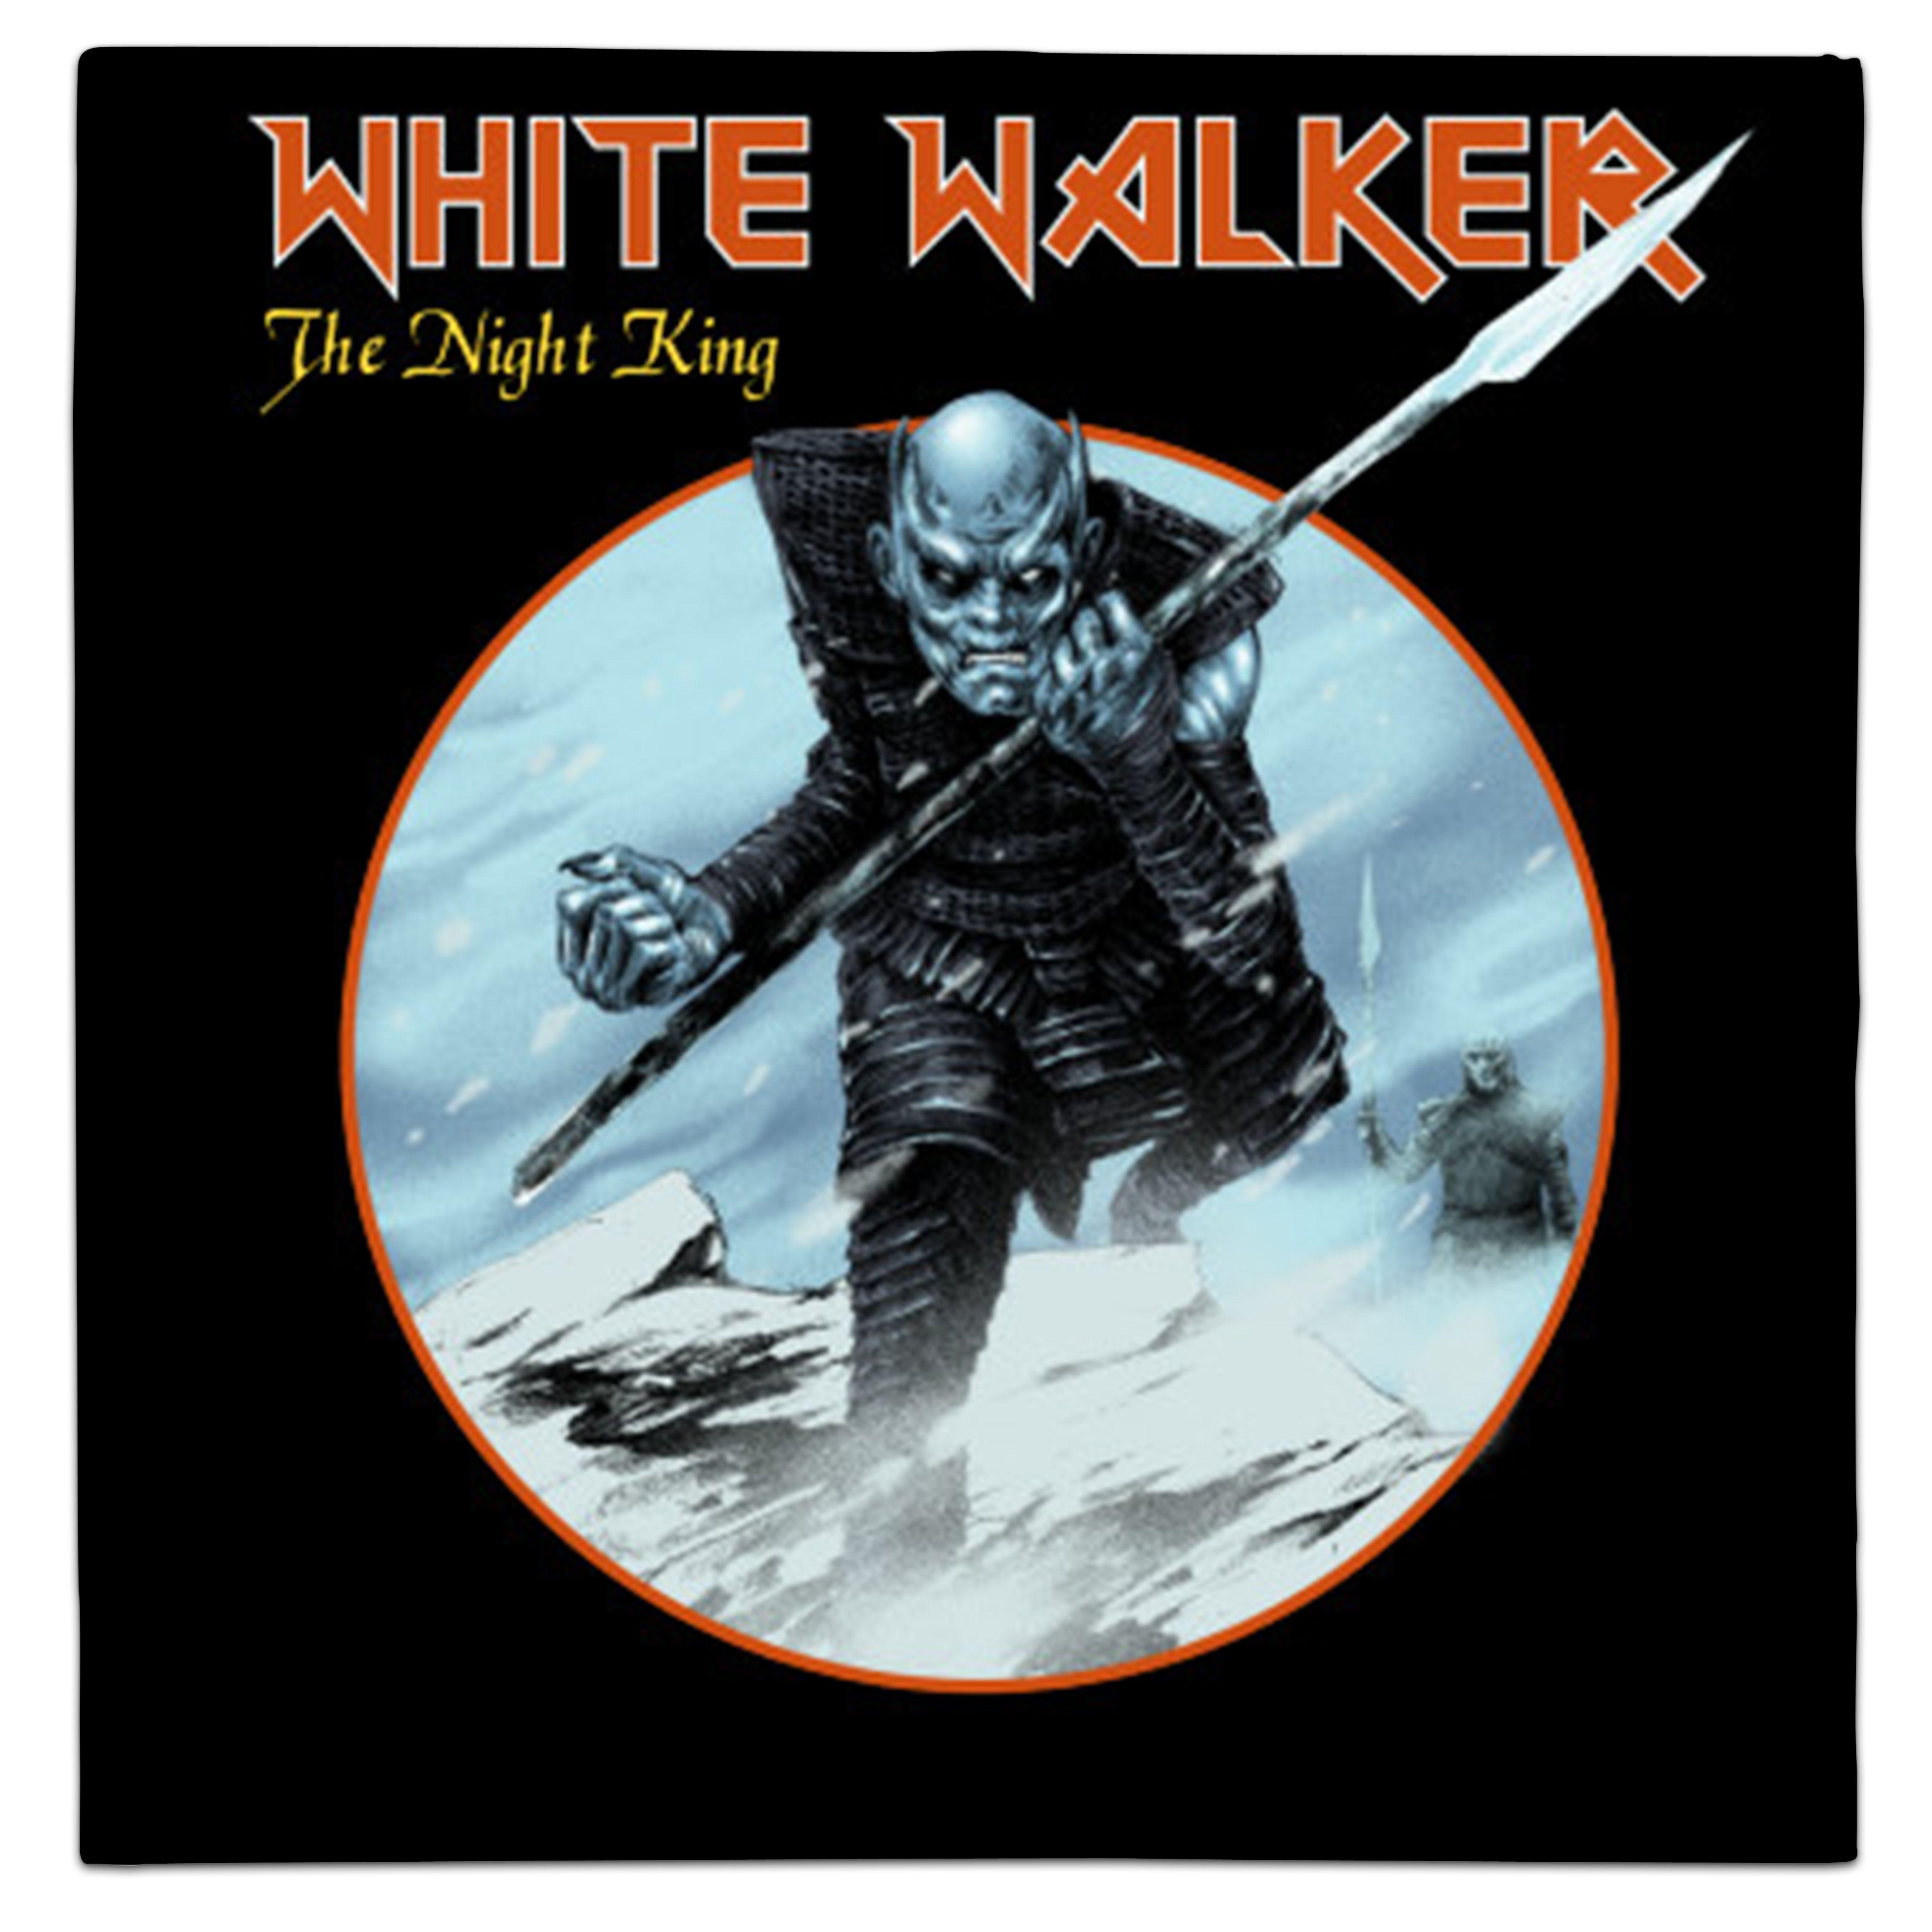 1e4a87418 Iron Maiden Trooper / Game of Thrones White Walker Vinyl Mash Up Parody by  Mathiole #album #vinyl #albumcover #albumart #music #lp #popart #mashup ...